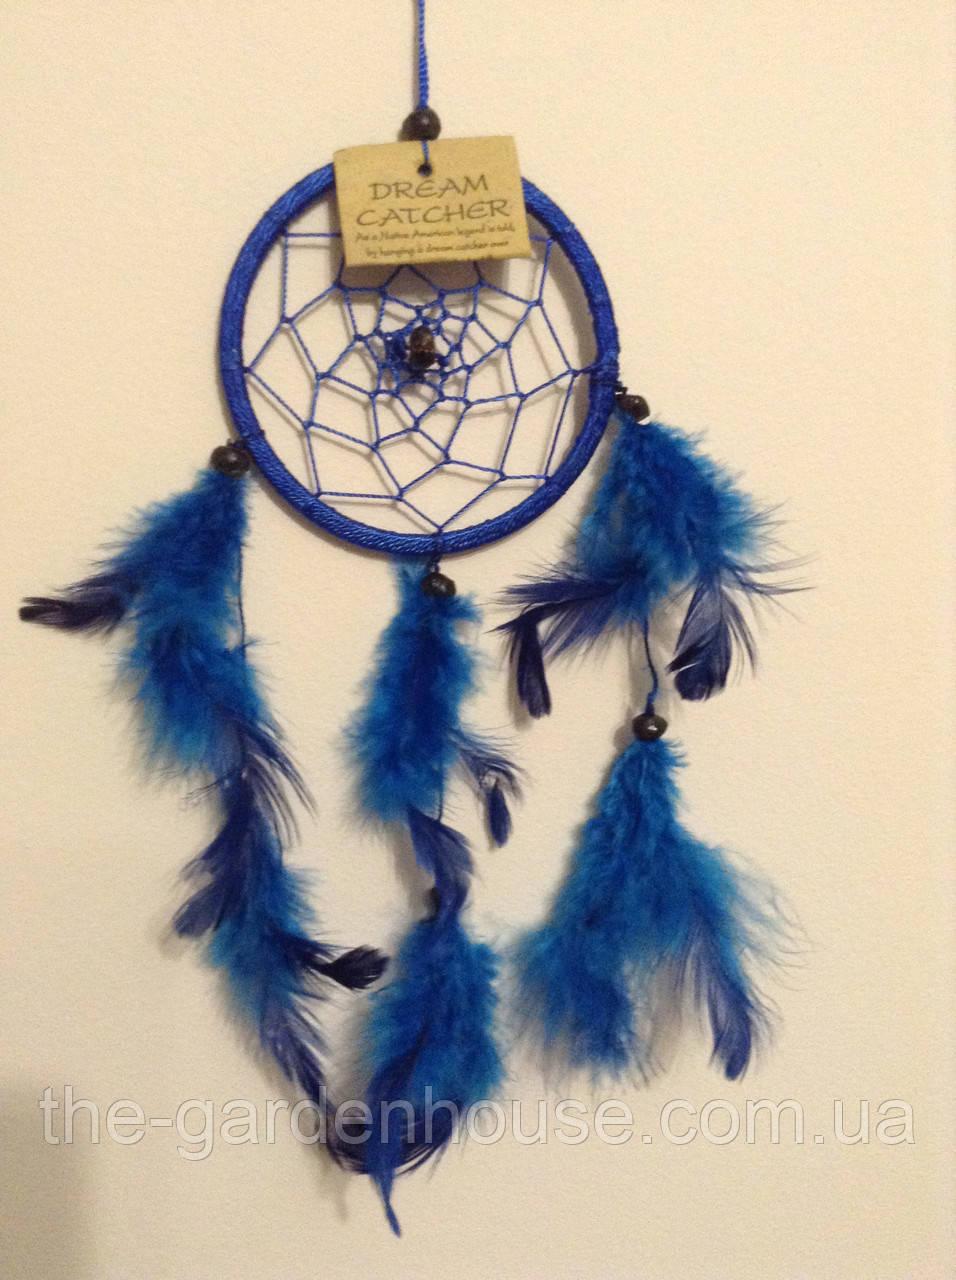 Ловец снов синий, d-6 см